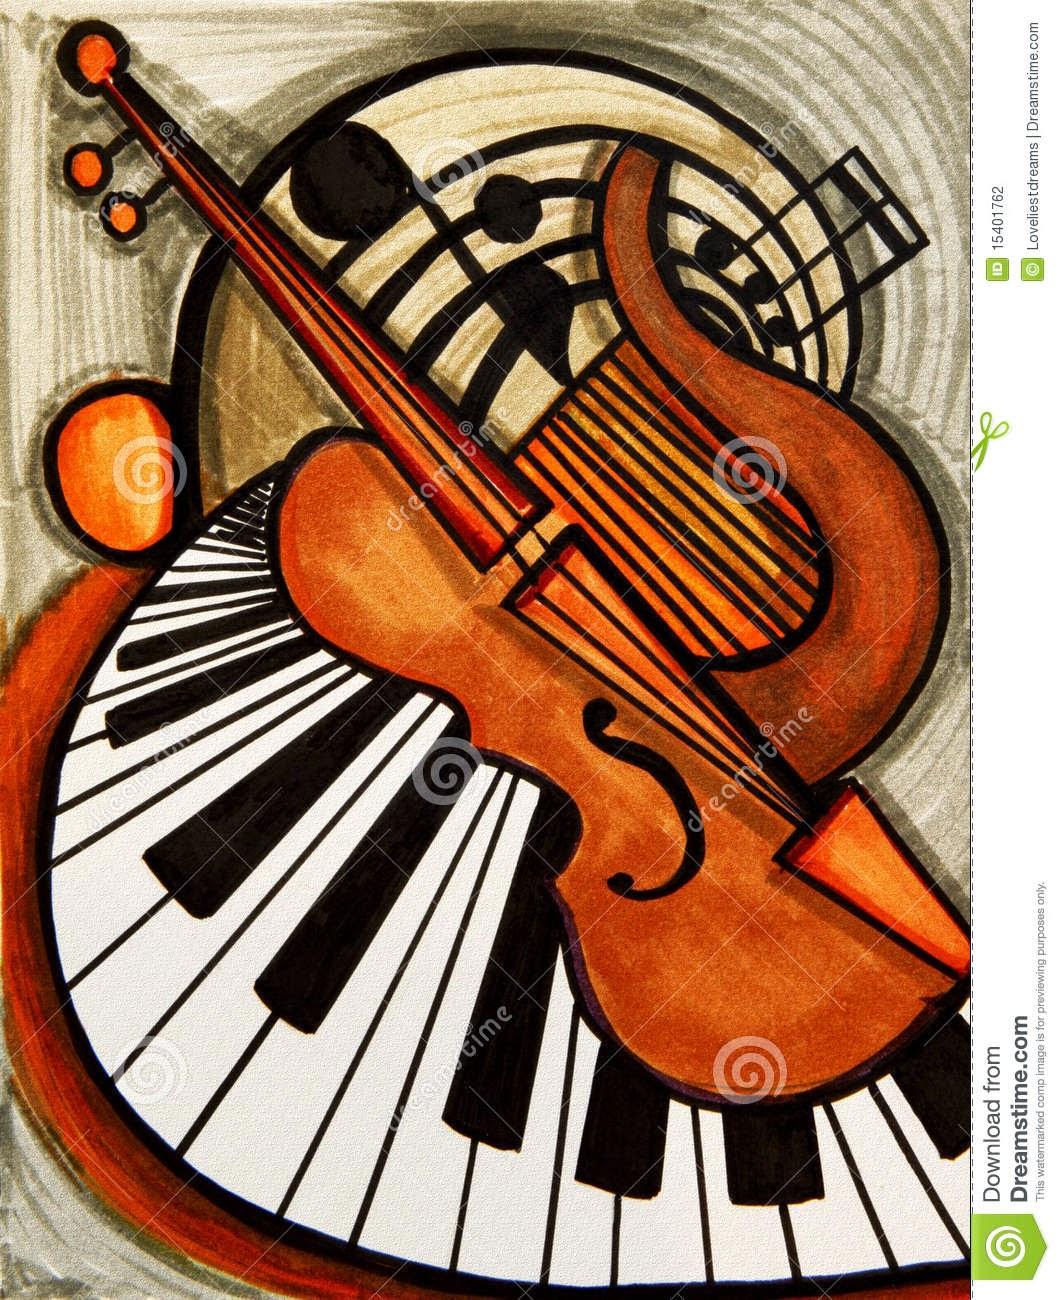 Worksheet. musica para nios